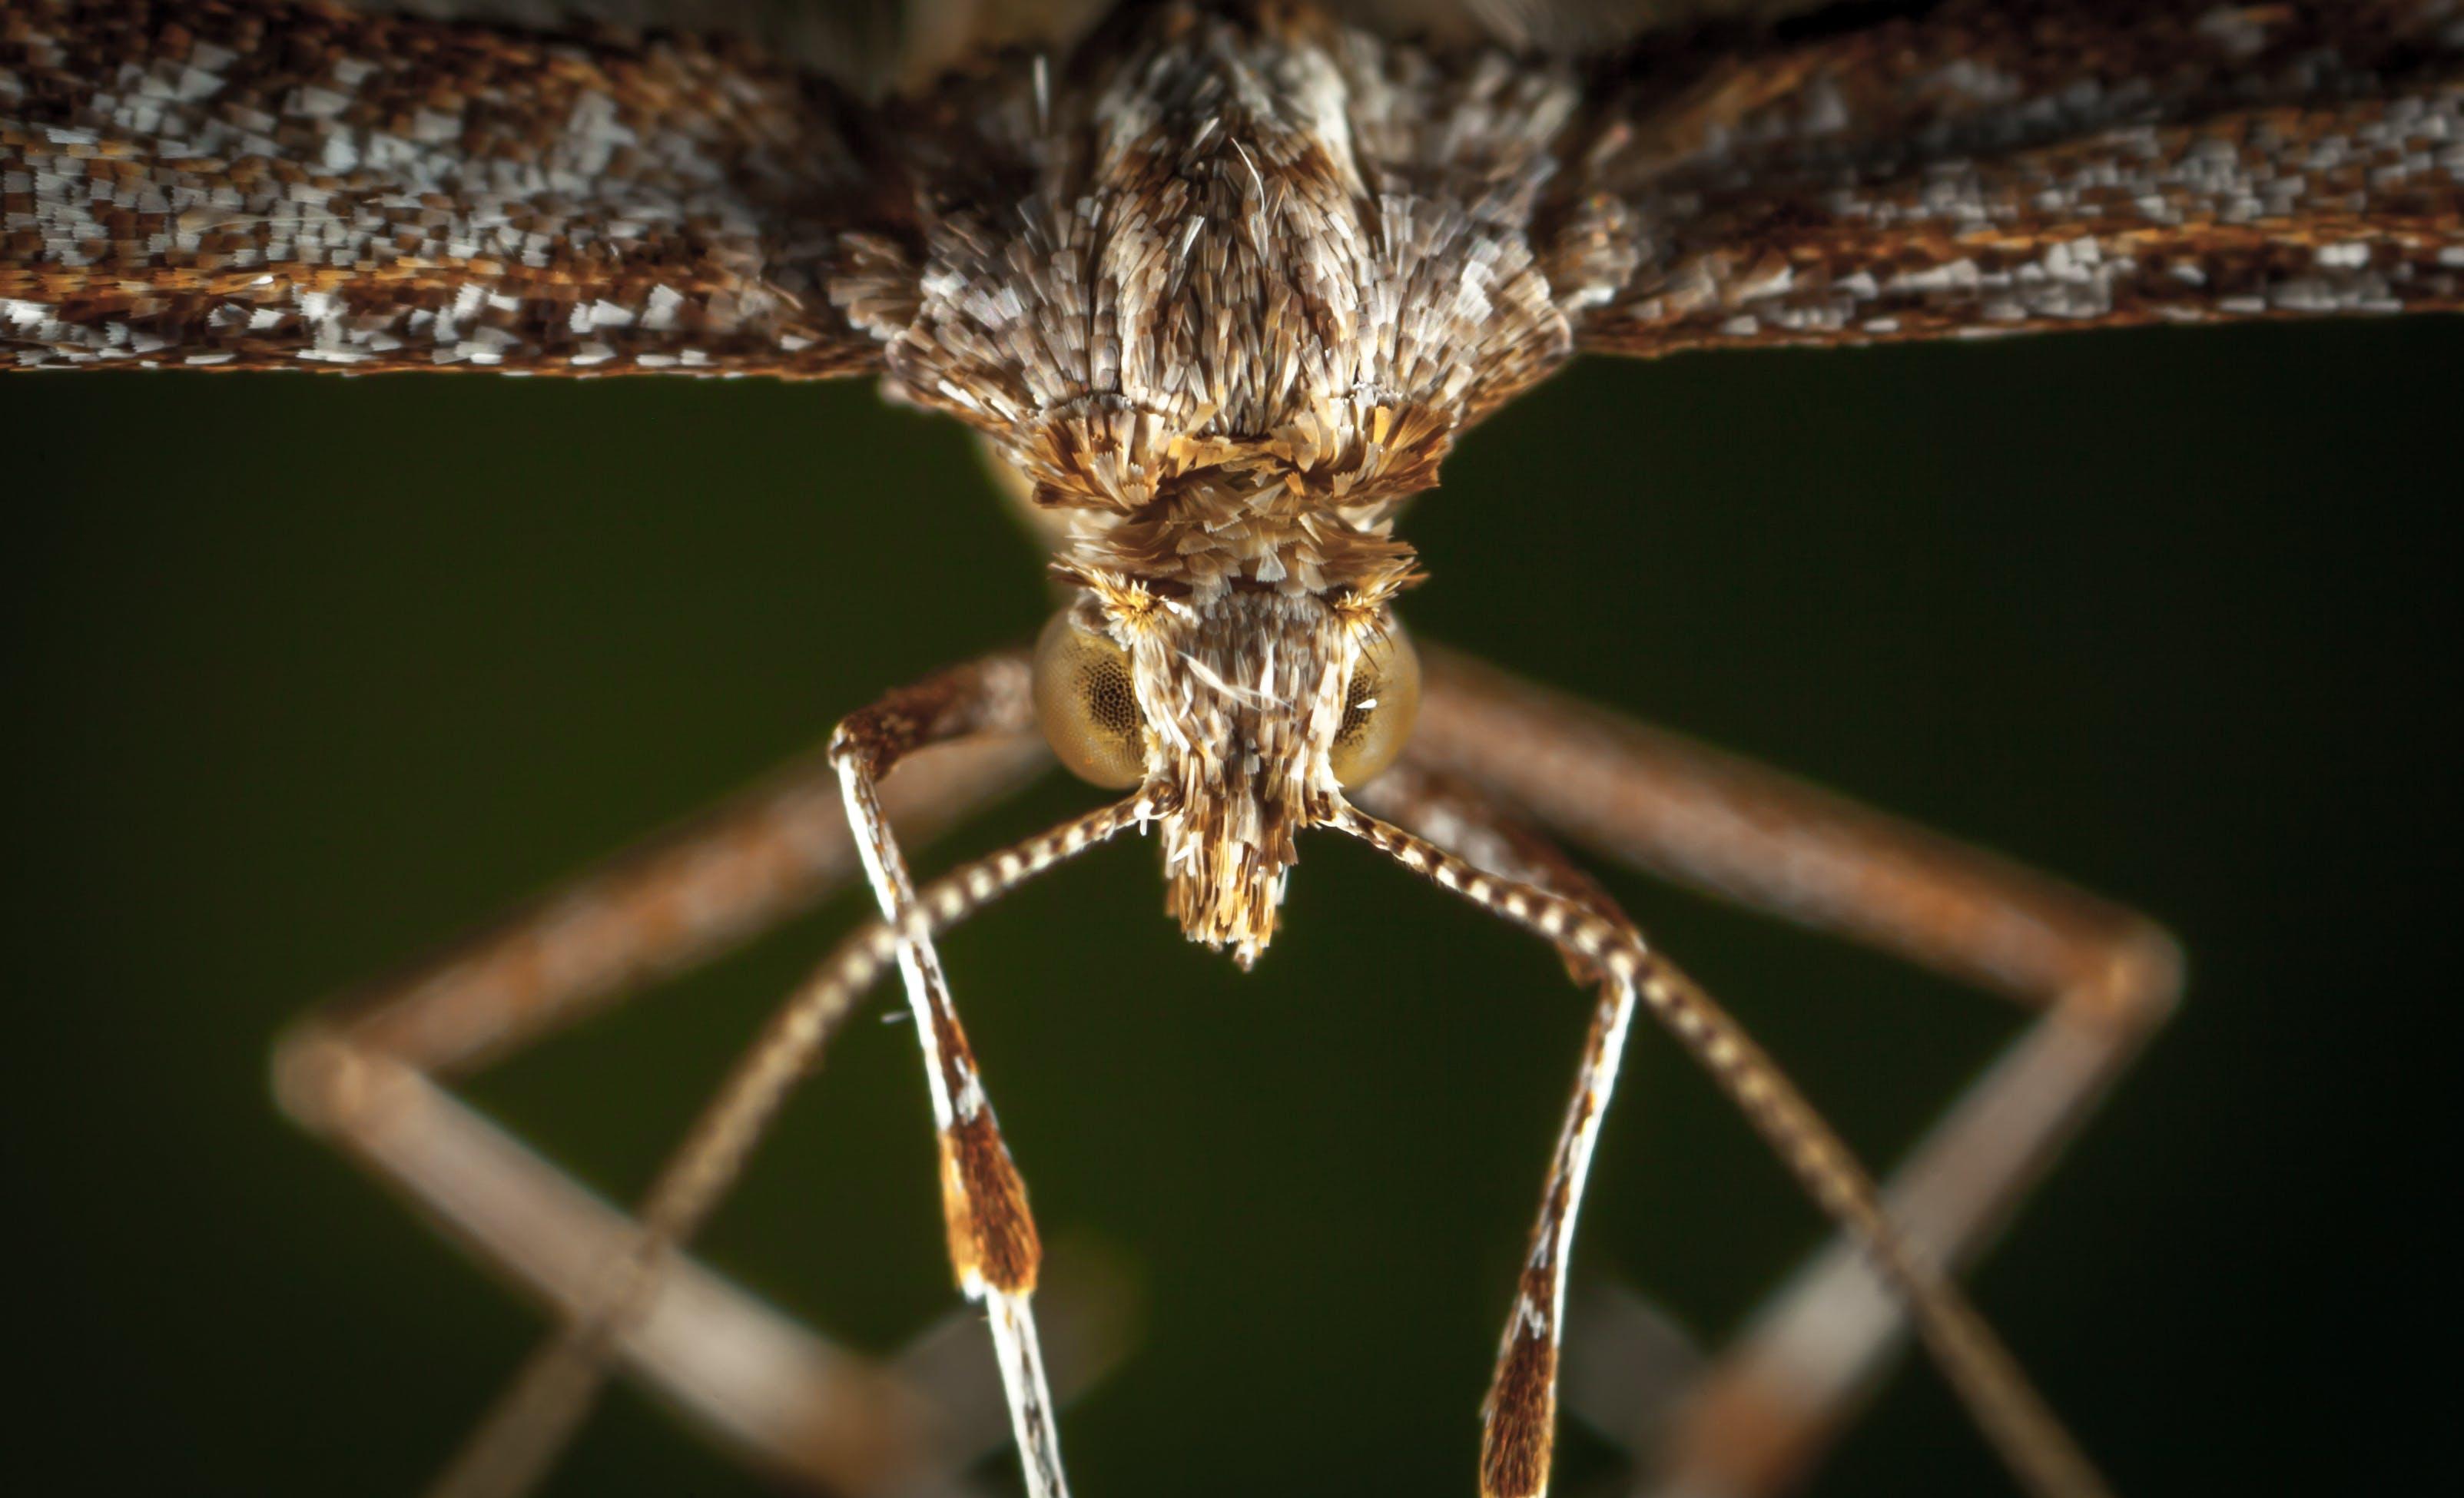 Kostnadsfri bild av djur, djurfotografi, fokus, insekt